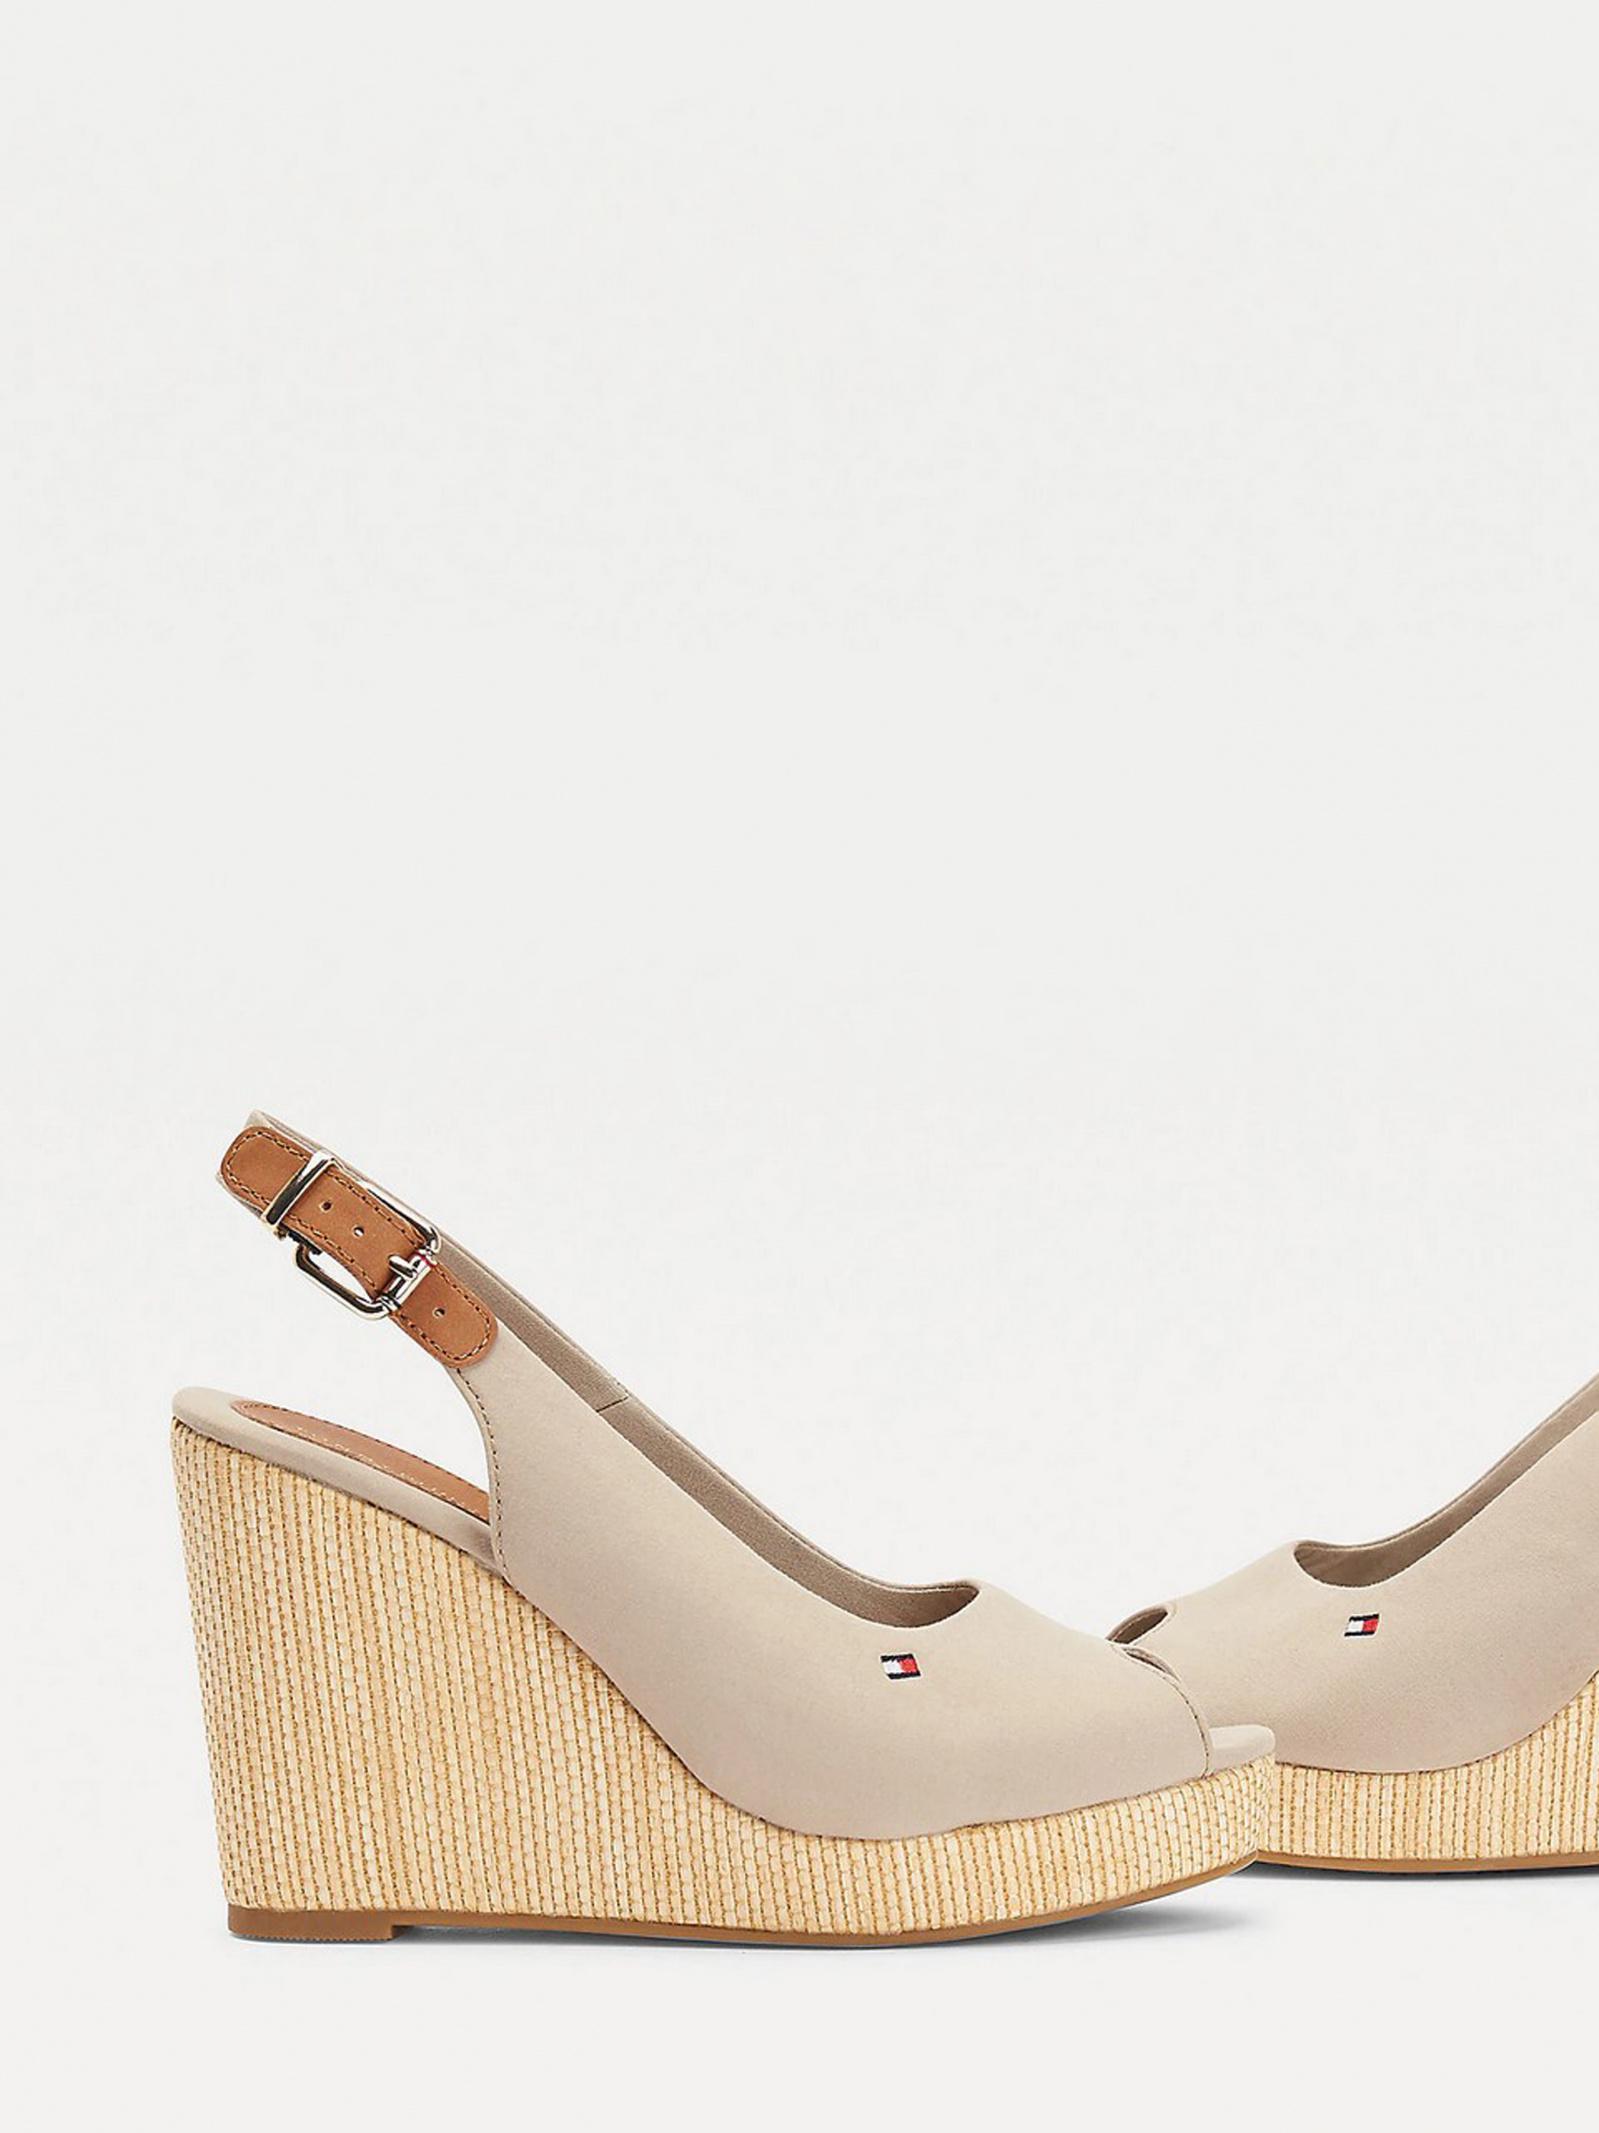 Босоніжки  для жінок Tommy Hilfiger ICONIC ELENA SLING BACK WEDGE FW0FW04789-AEP розмірна сітка взуття, 2017